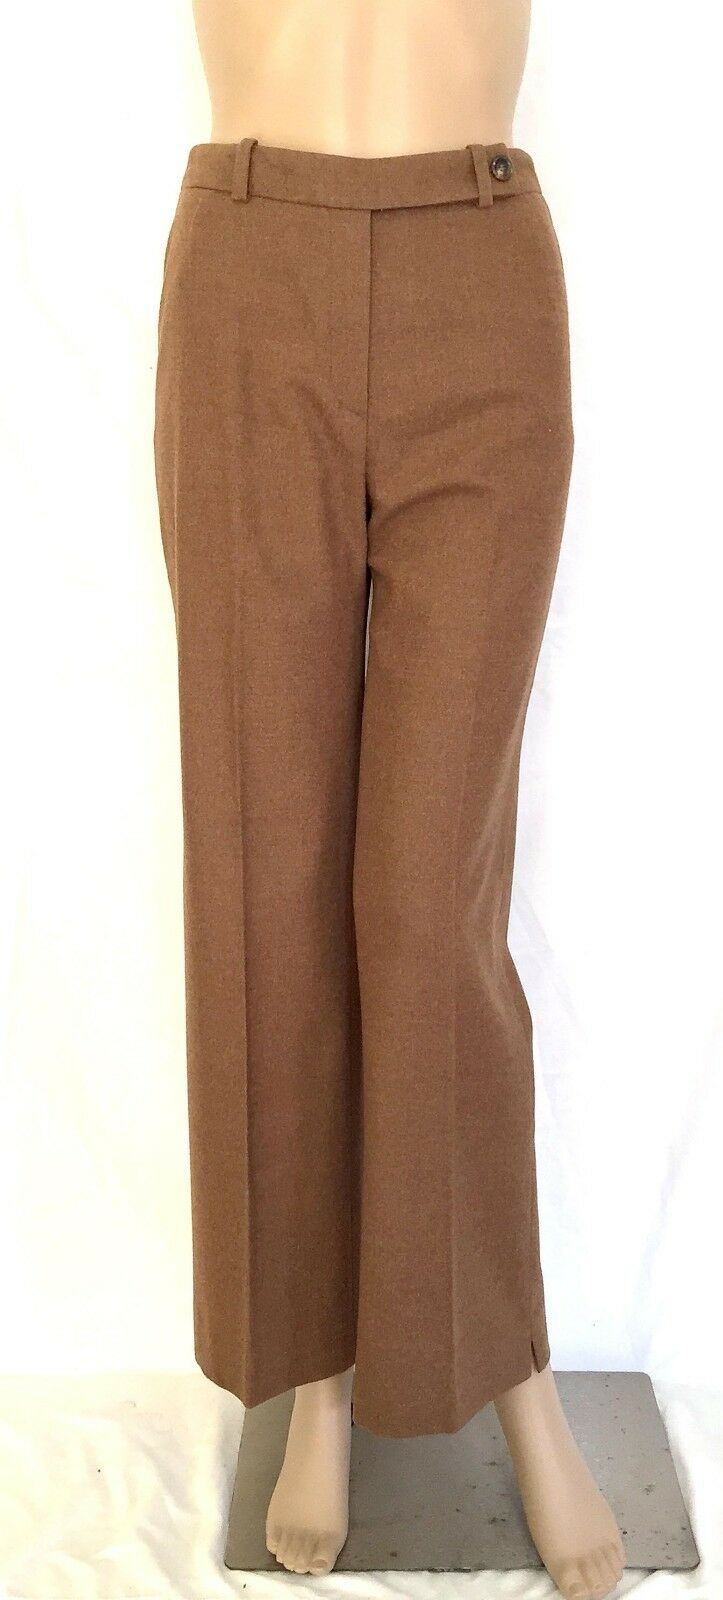 AKRIS braun Wool Blend Taperot Straight Legged Pants - Größe 4 - EUC